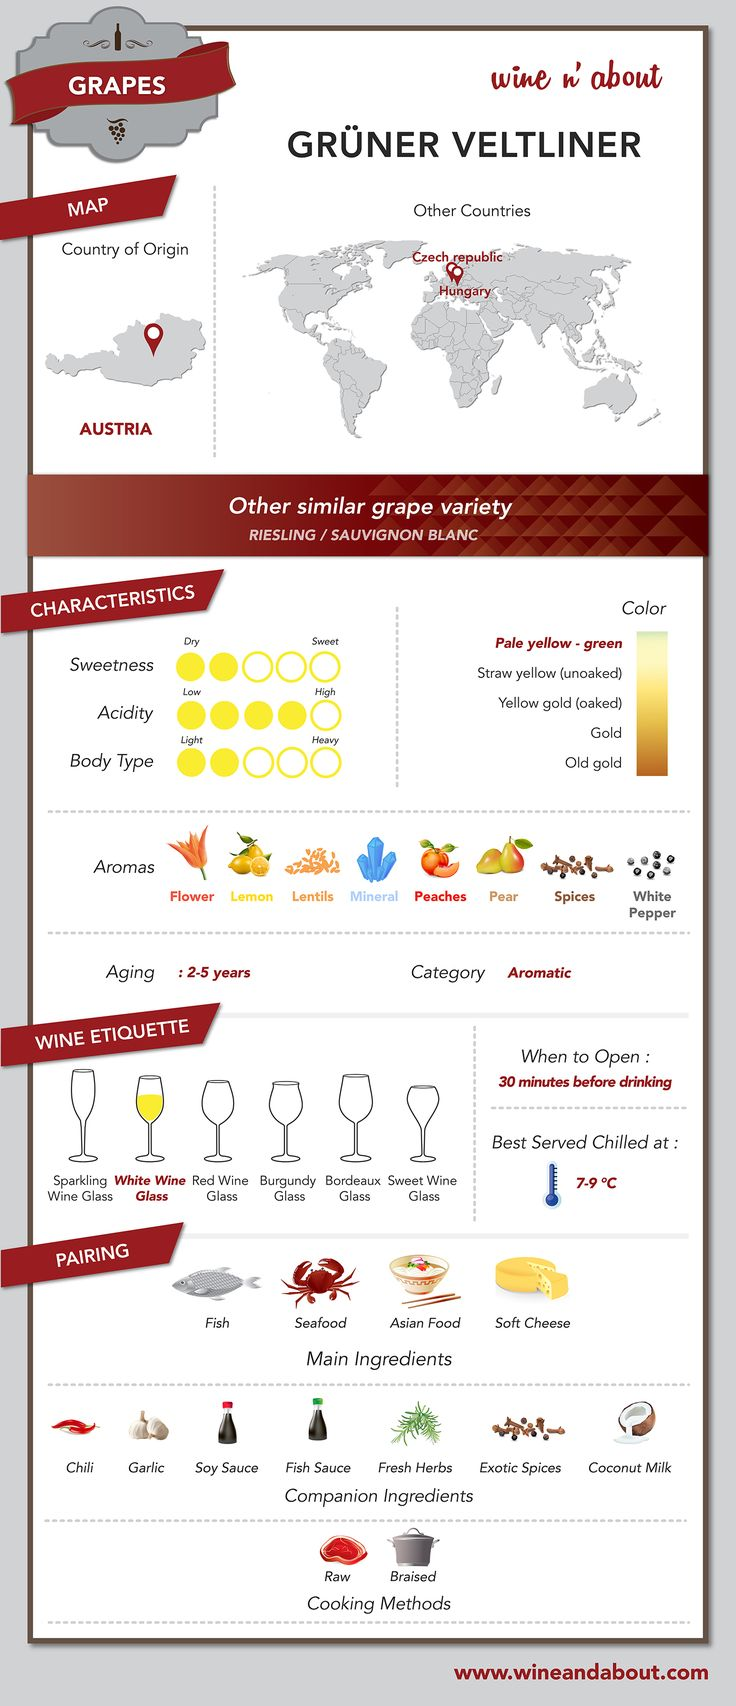 Afbeelding van http://wineandabout.com/wp-content/uploads/2014/07/WineAbout-D1-GRAPE-GRUNER-VELTLINER_140709-01.jpg.